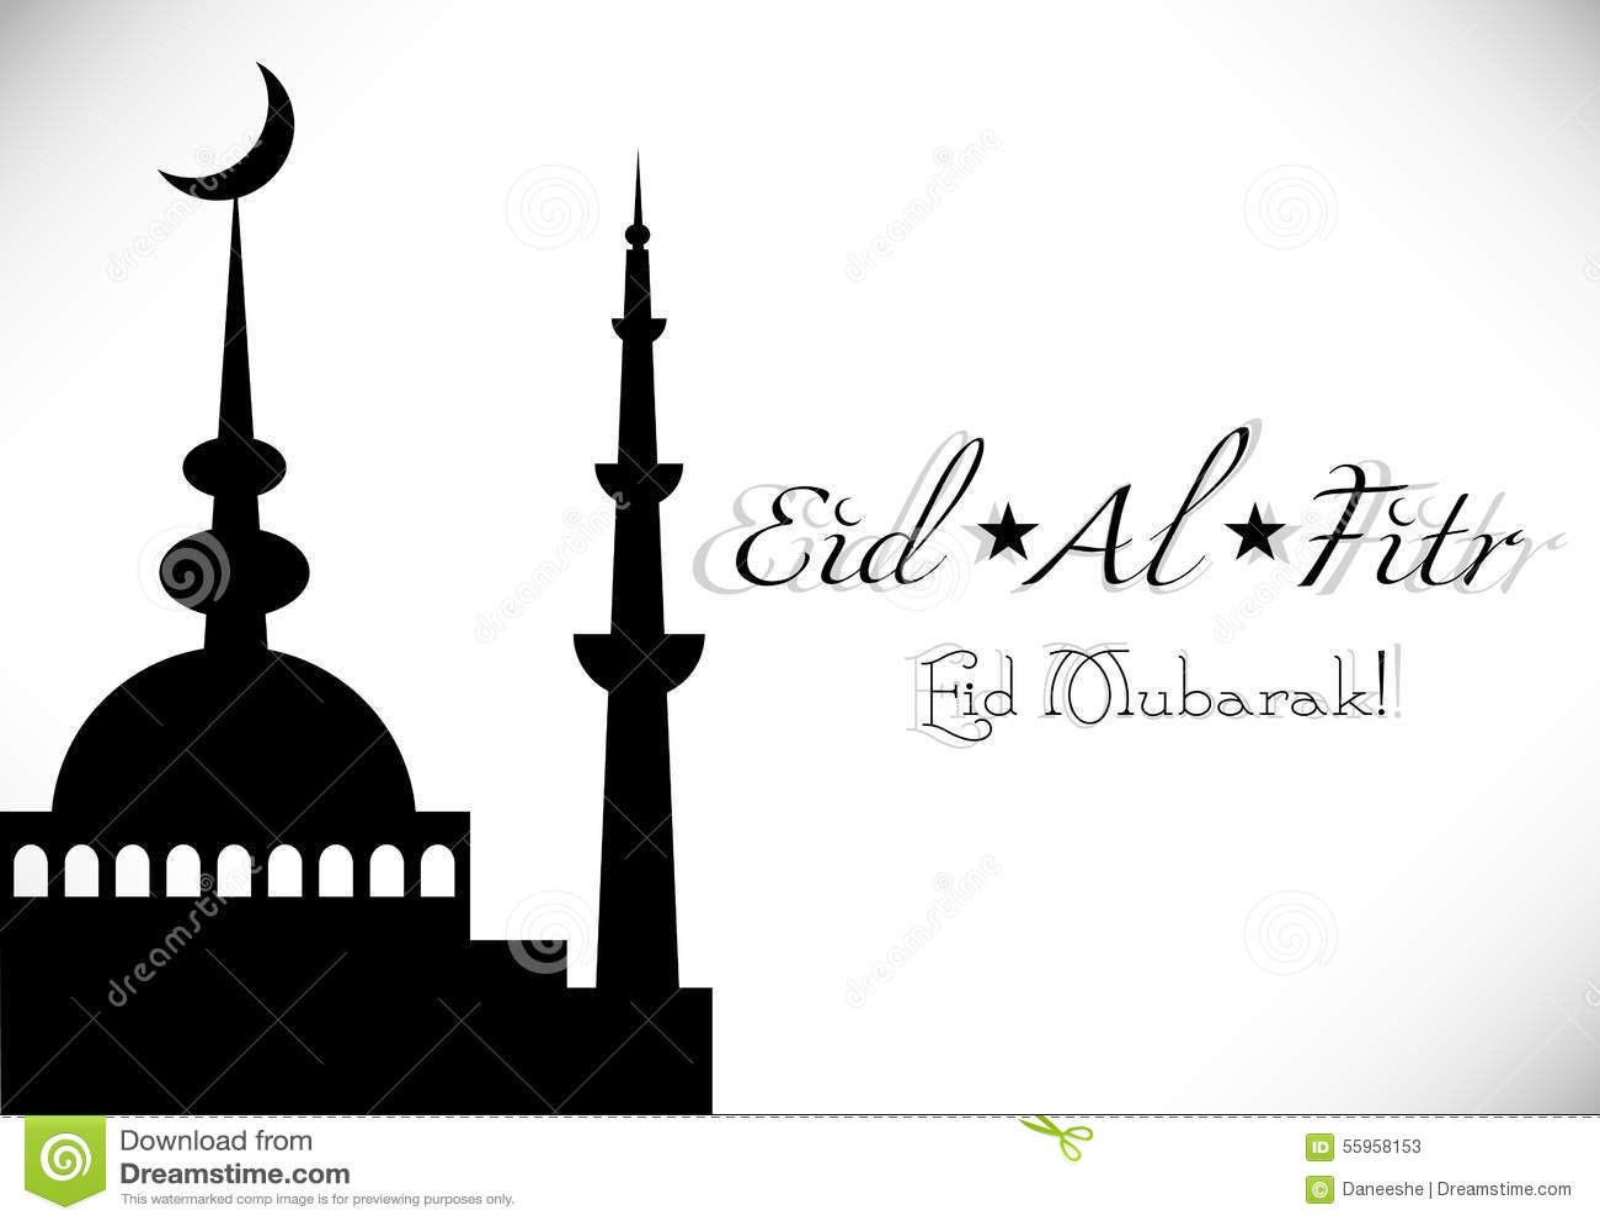 Download Traditional Eid Al-Fitr Feast - card-greeting-islamic-feast-eid-al-fitr-mosque-white-finishing-fasting-month-ramadan-holiday-vector-illustration-55958153  Image_928678 .jpg